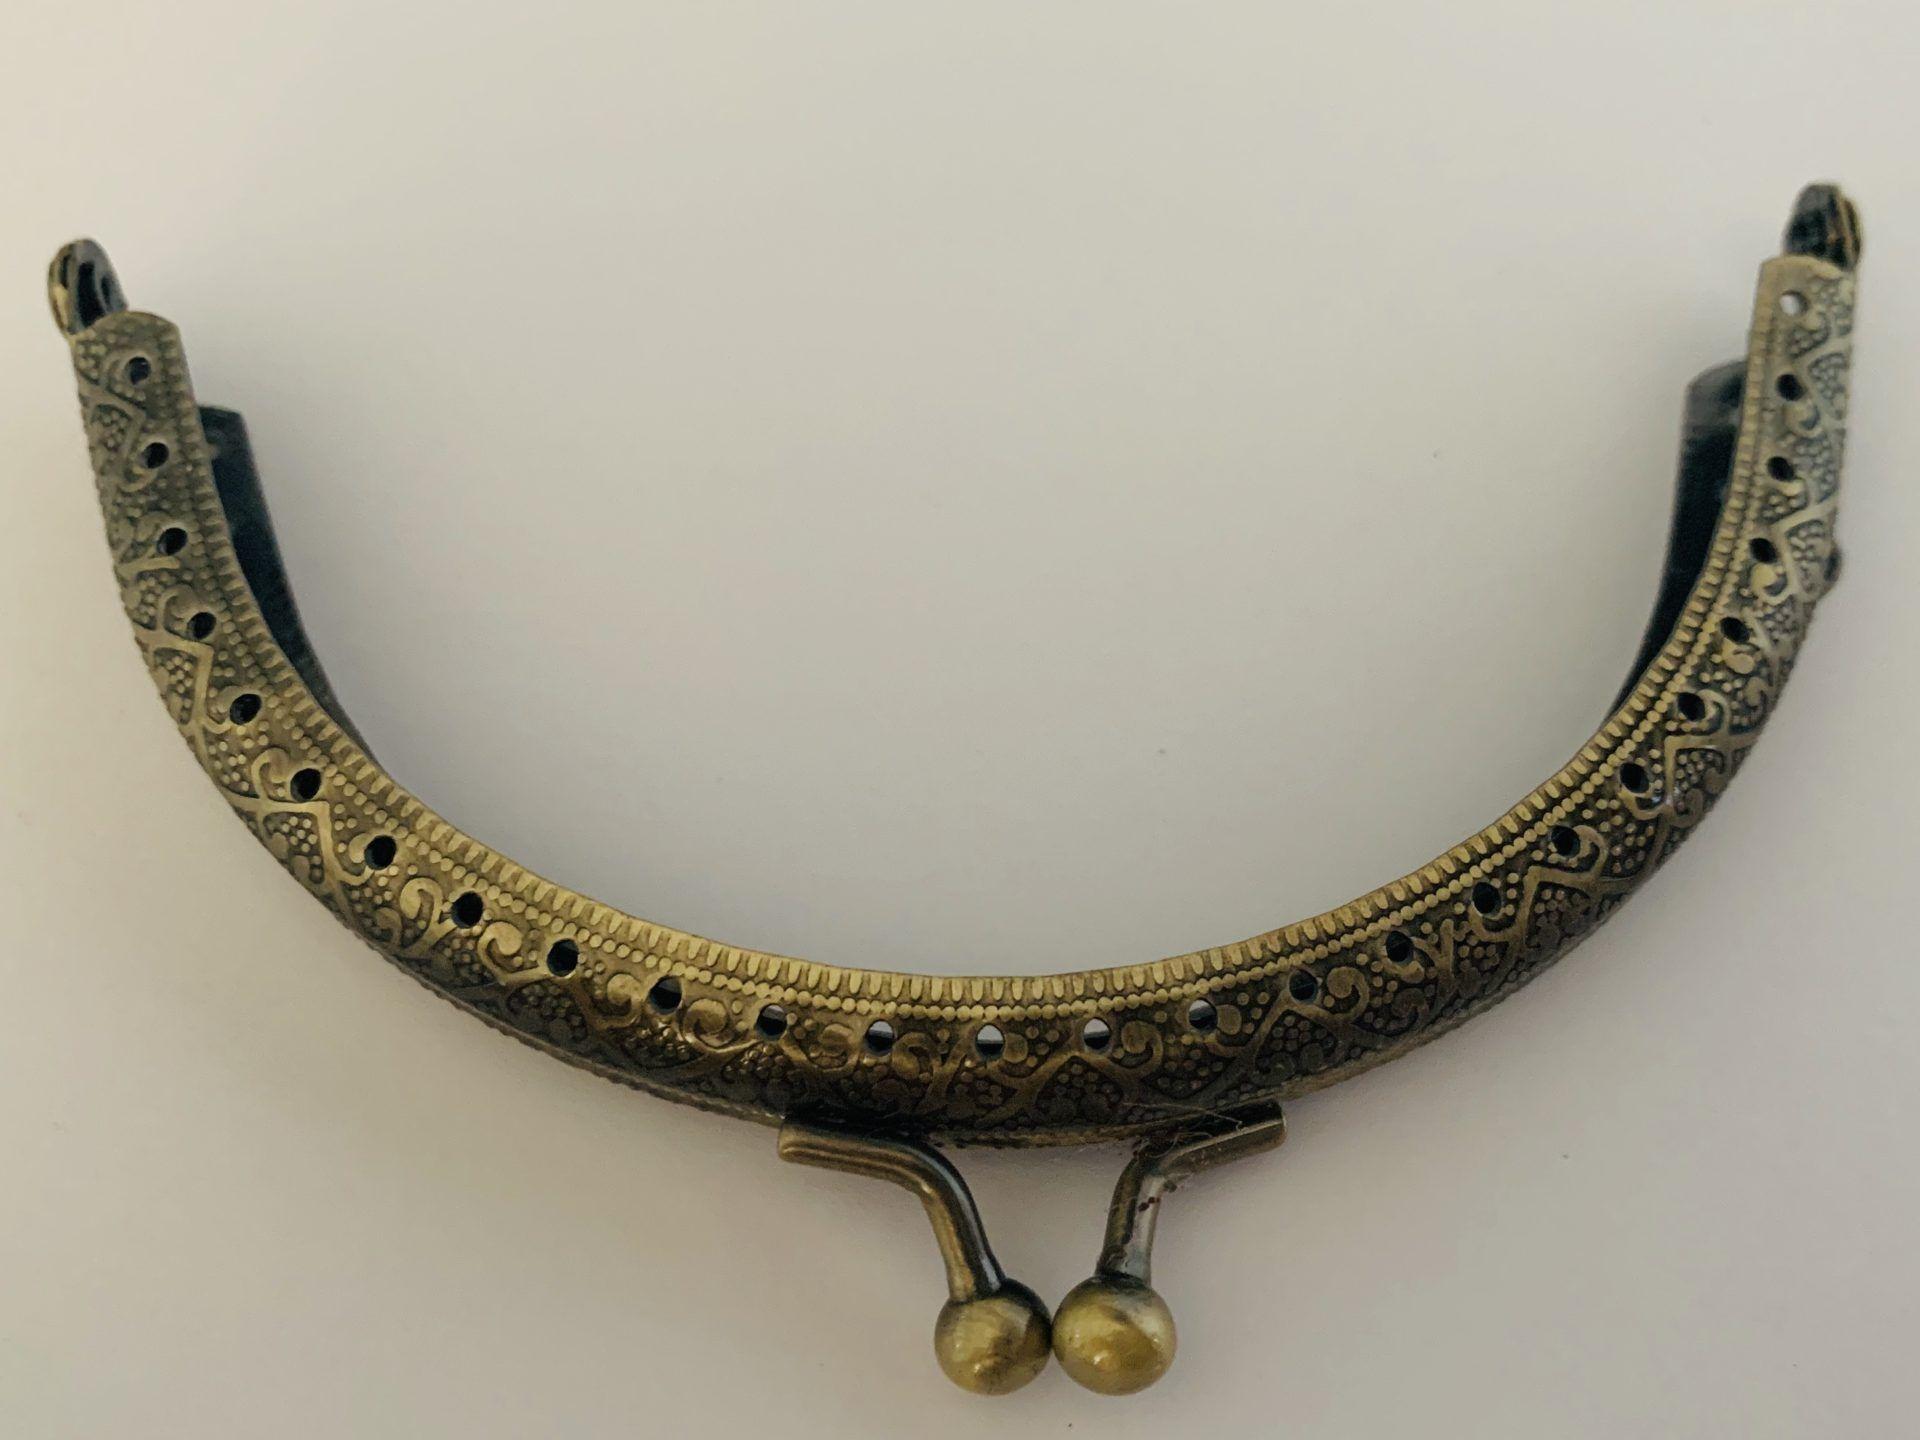 acheter code promo rencontrer Fermoir porte monnaie ou sac Bronze style vintage 10 cm